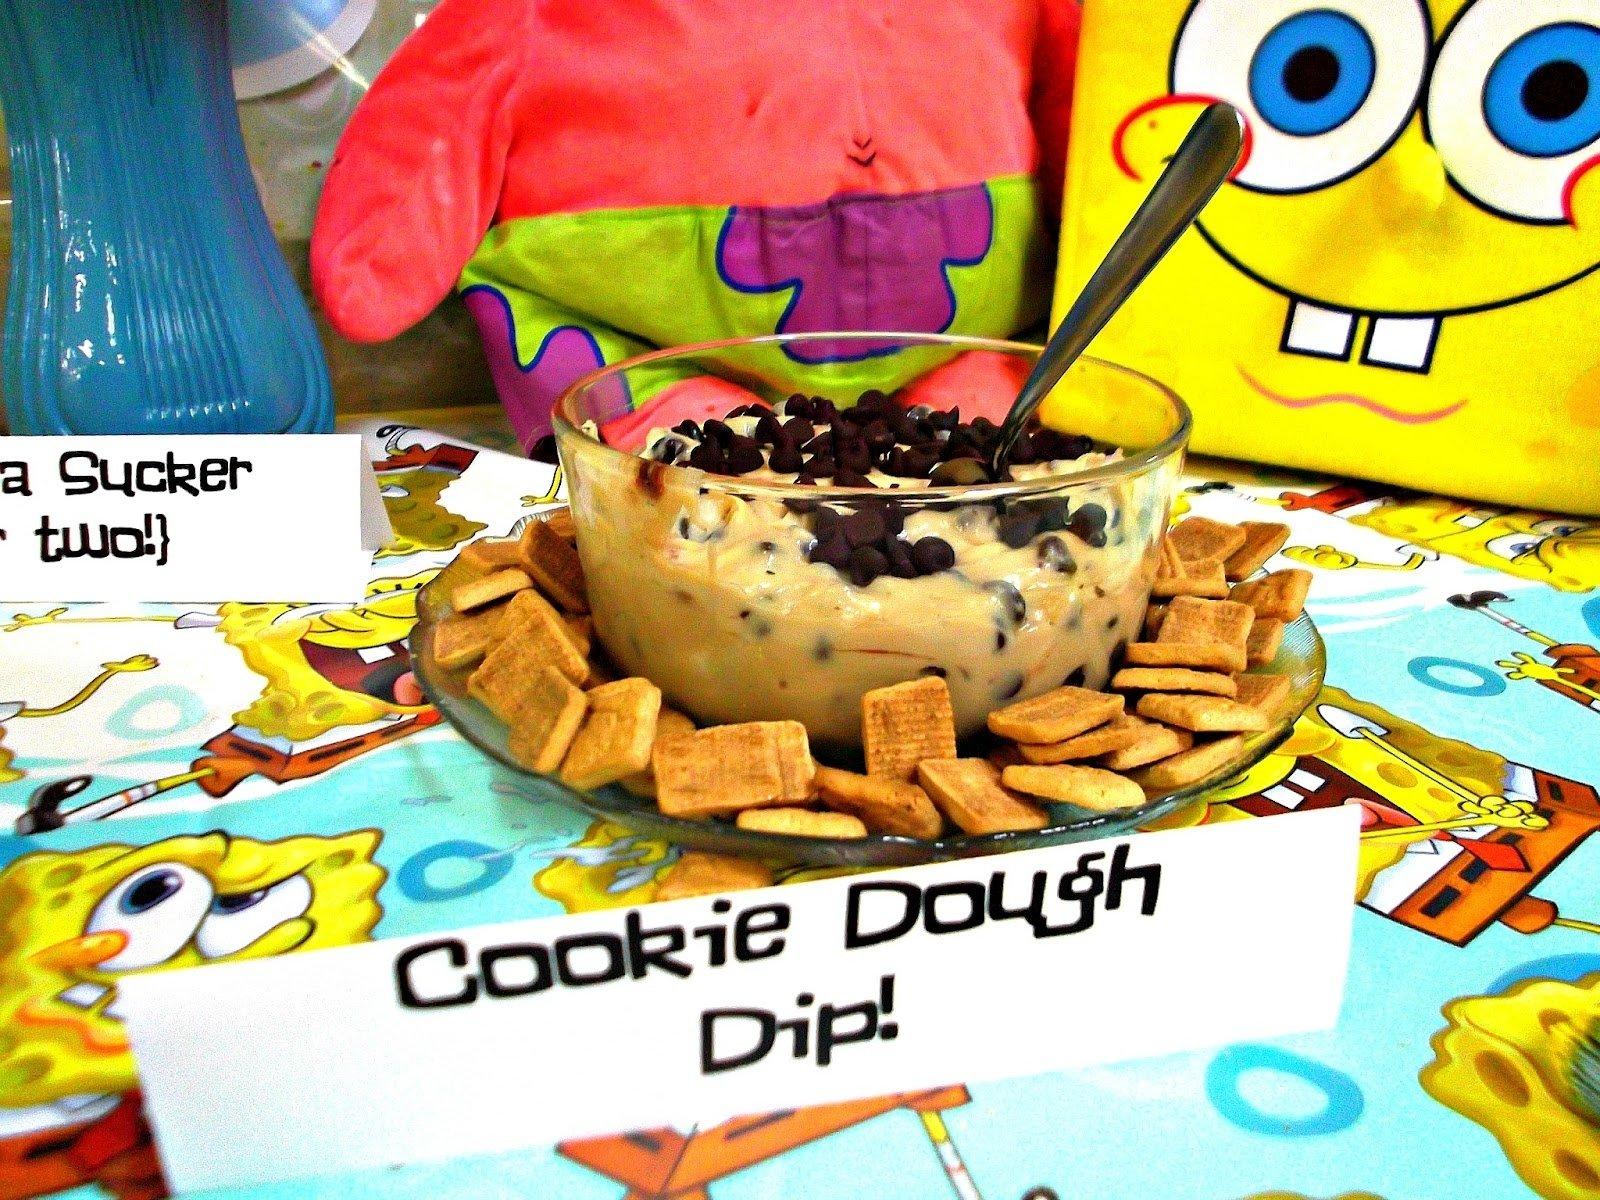 10 Trendy Spongebob Birthday Party Food Ideas tennessee honey spongebob party photo dump 2020